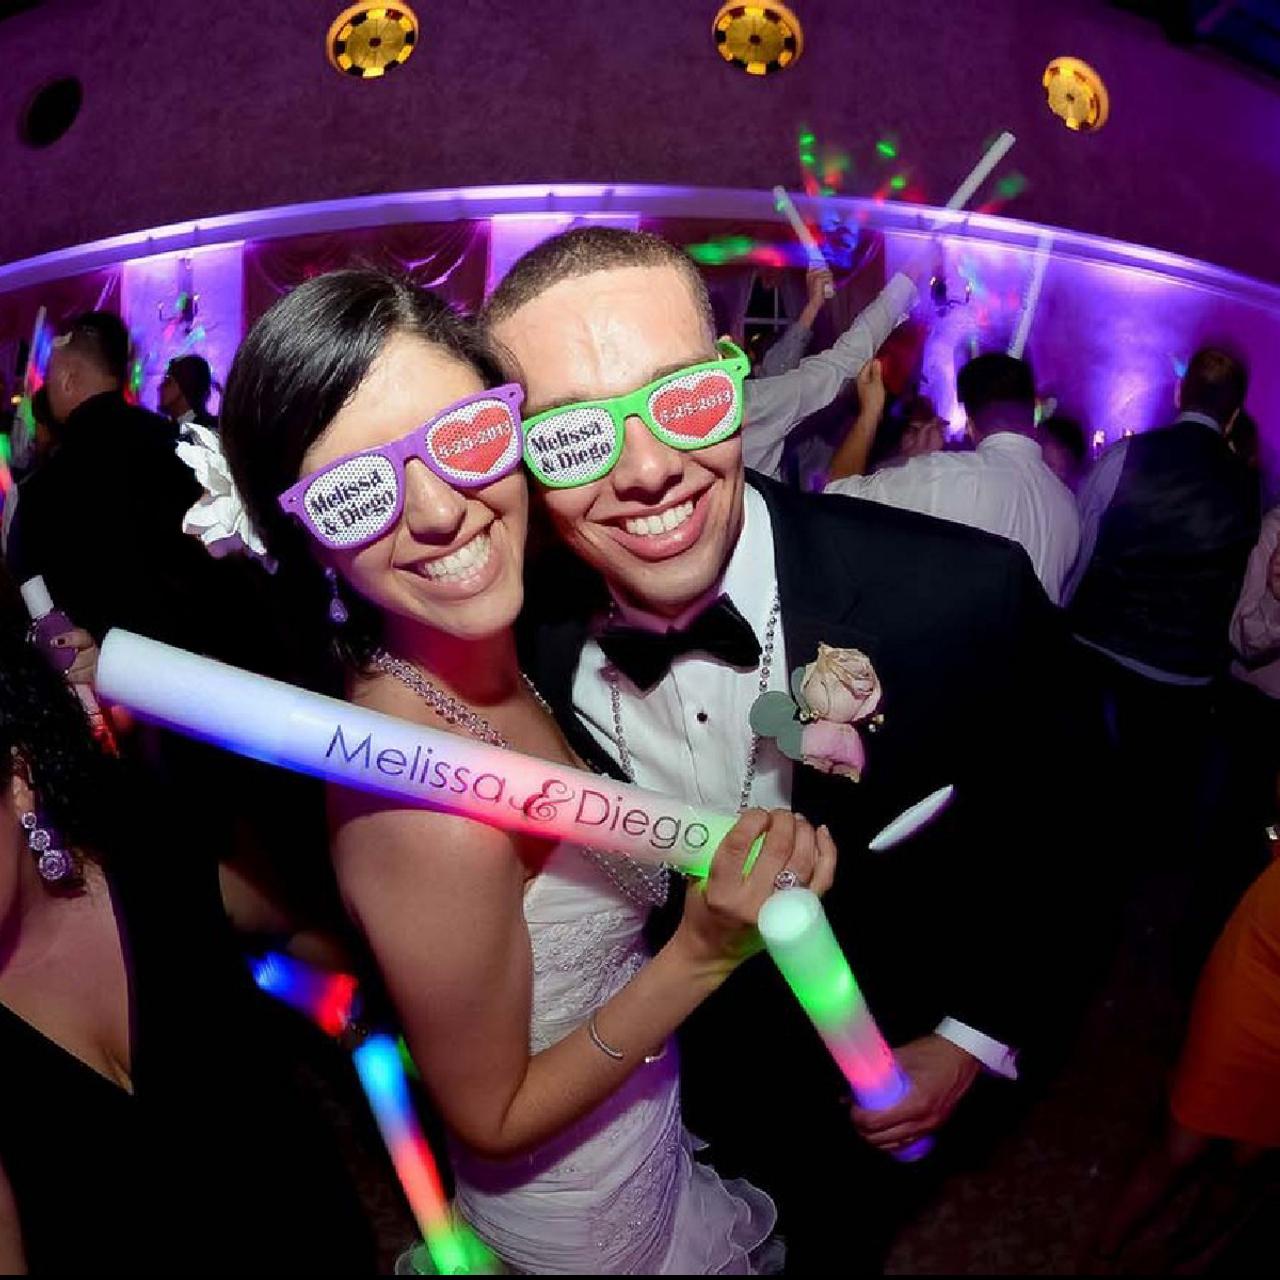 Customized Sunglasses in bulk For Wedding | King of Sparklers